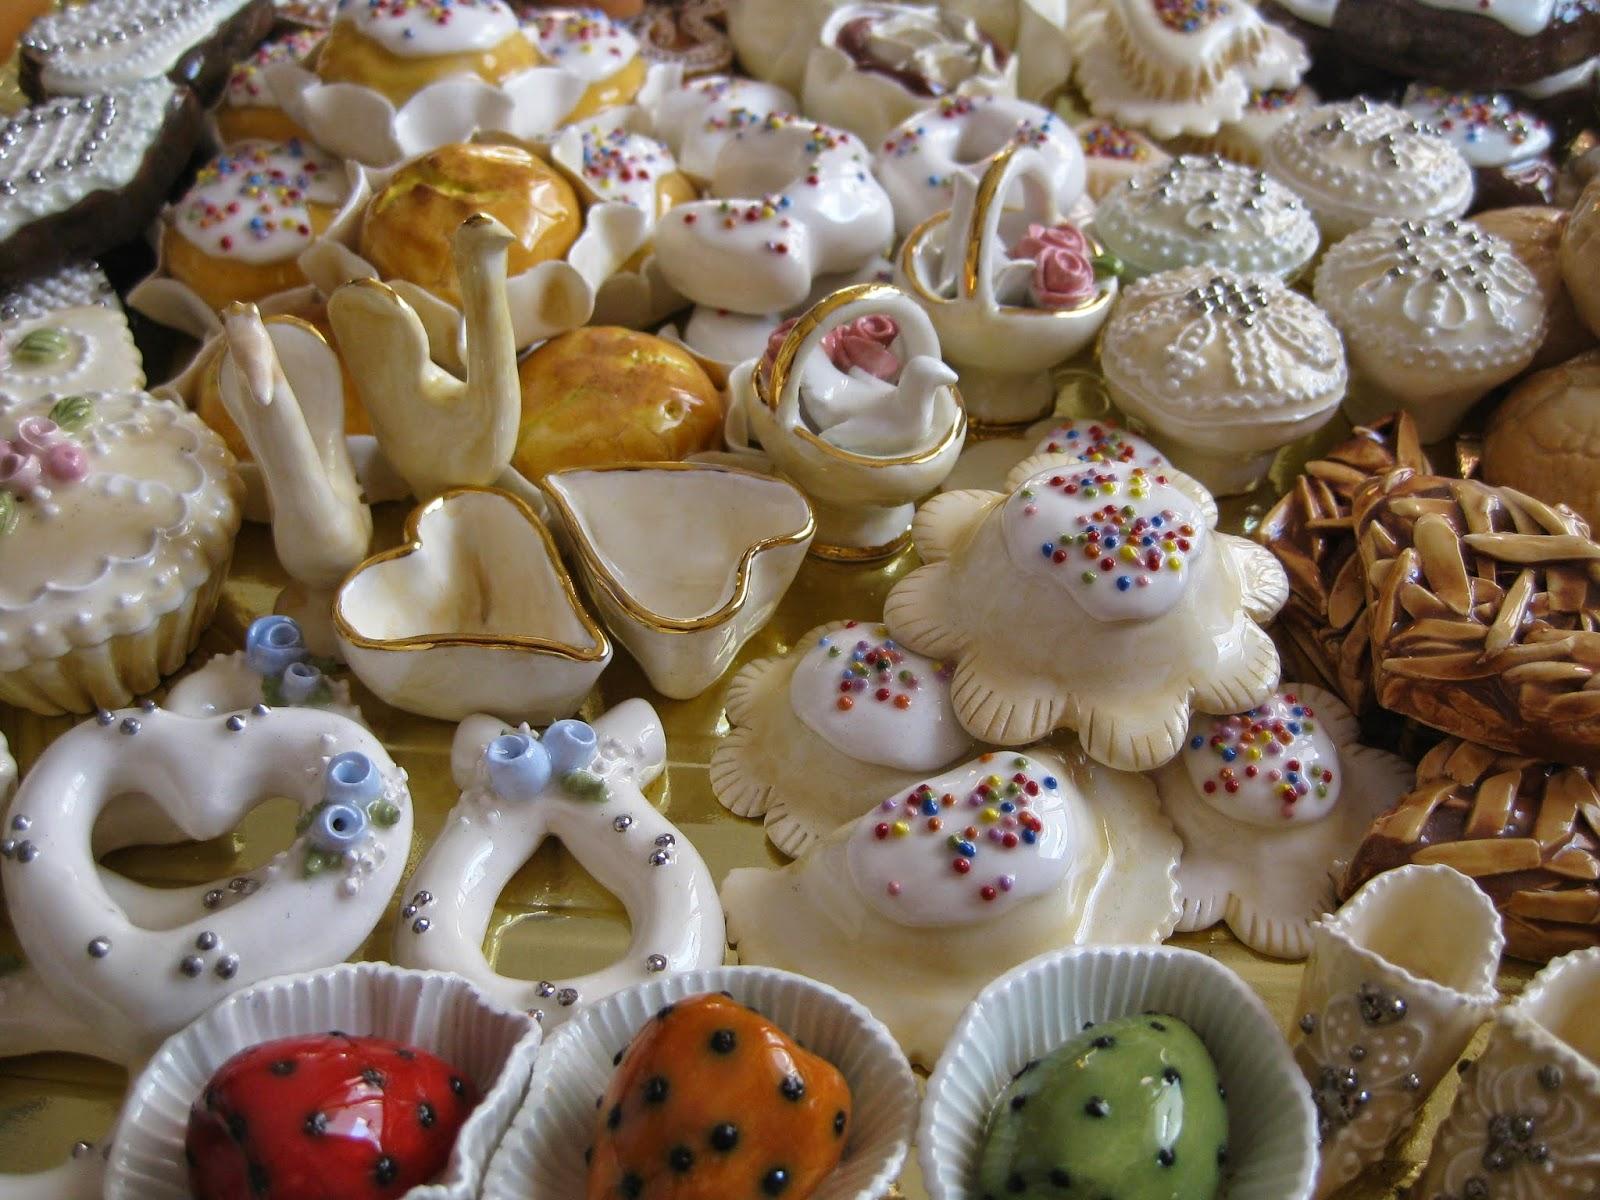 cento gr di zucchero i dolci sardi